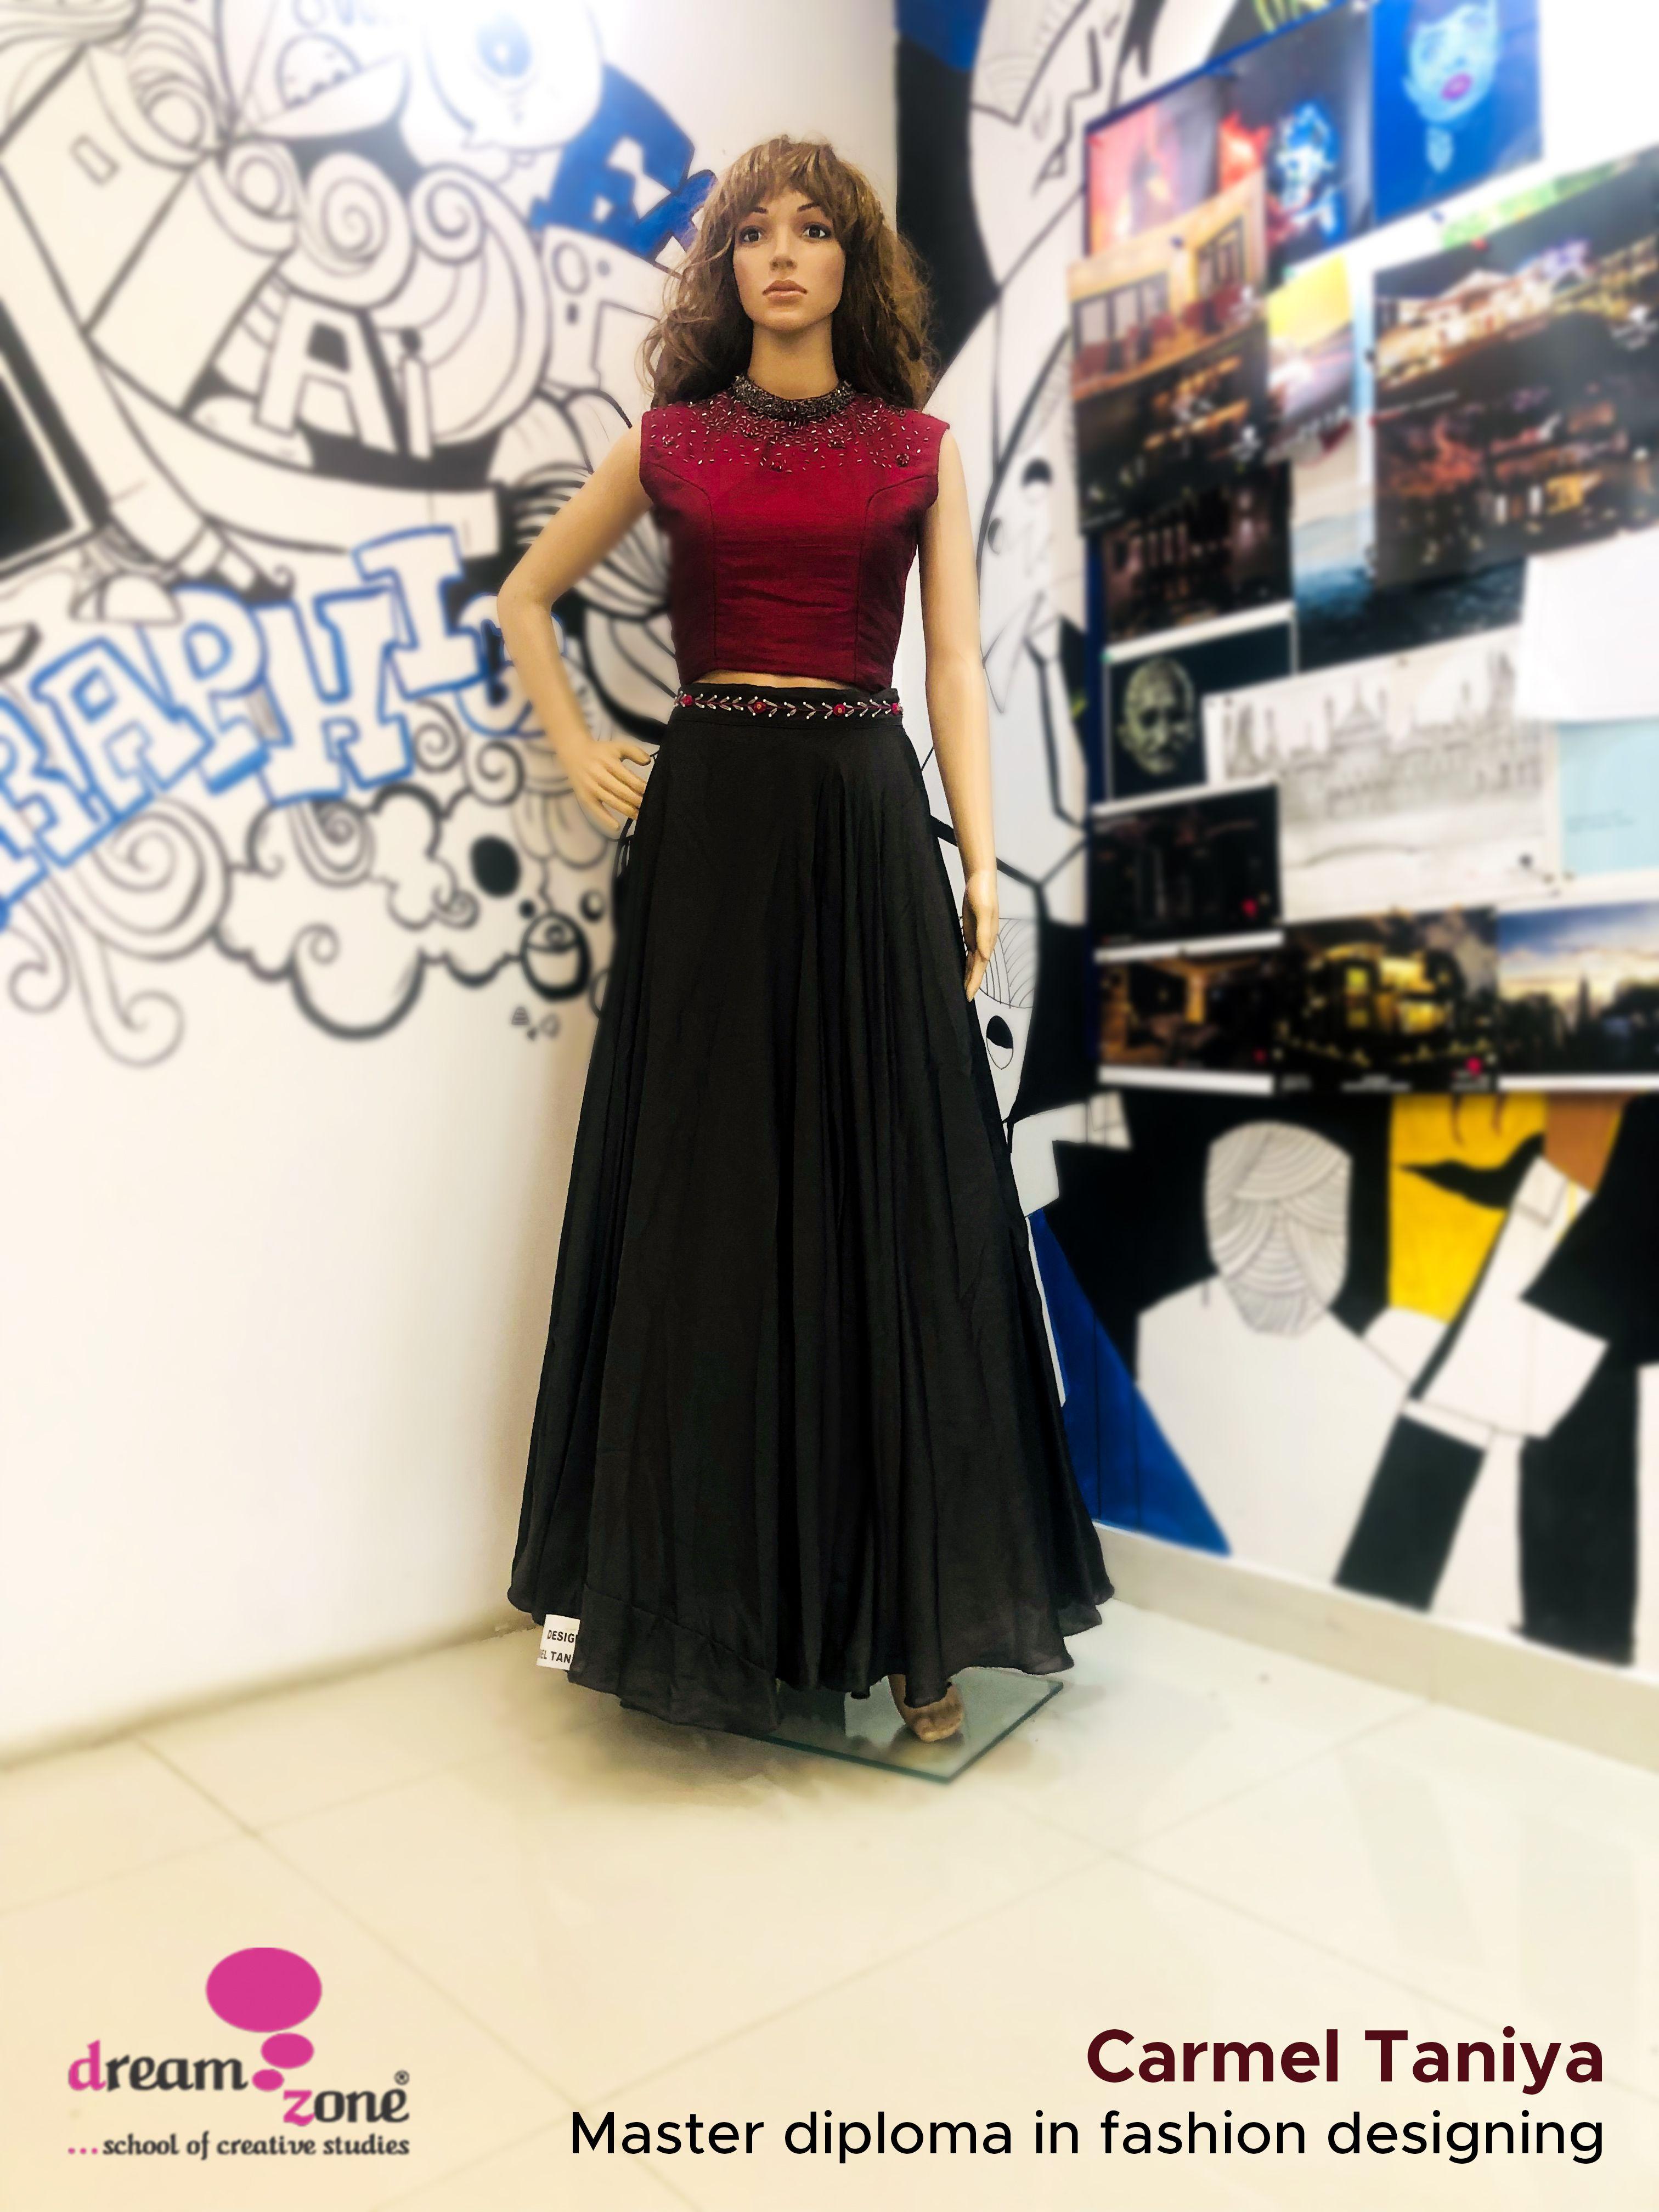 Fashion Designing Courses In Kochi Fashion Designing Course Diploma In Fashion Designing Fashion Design